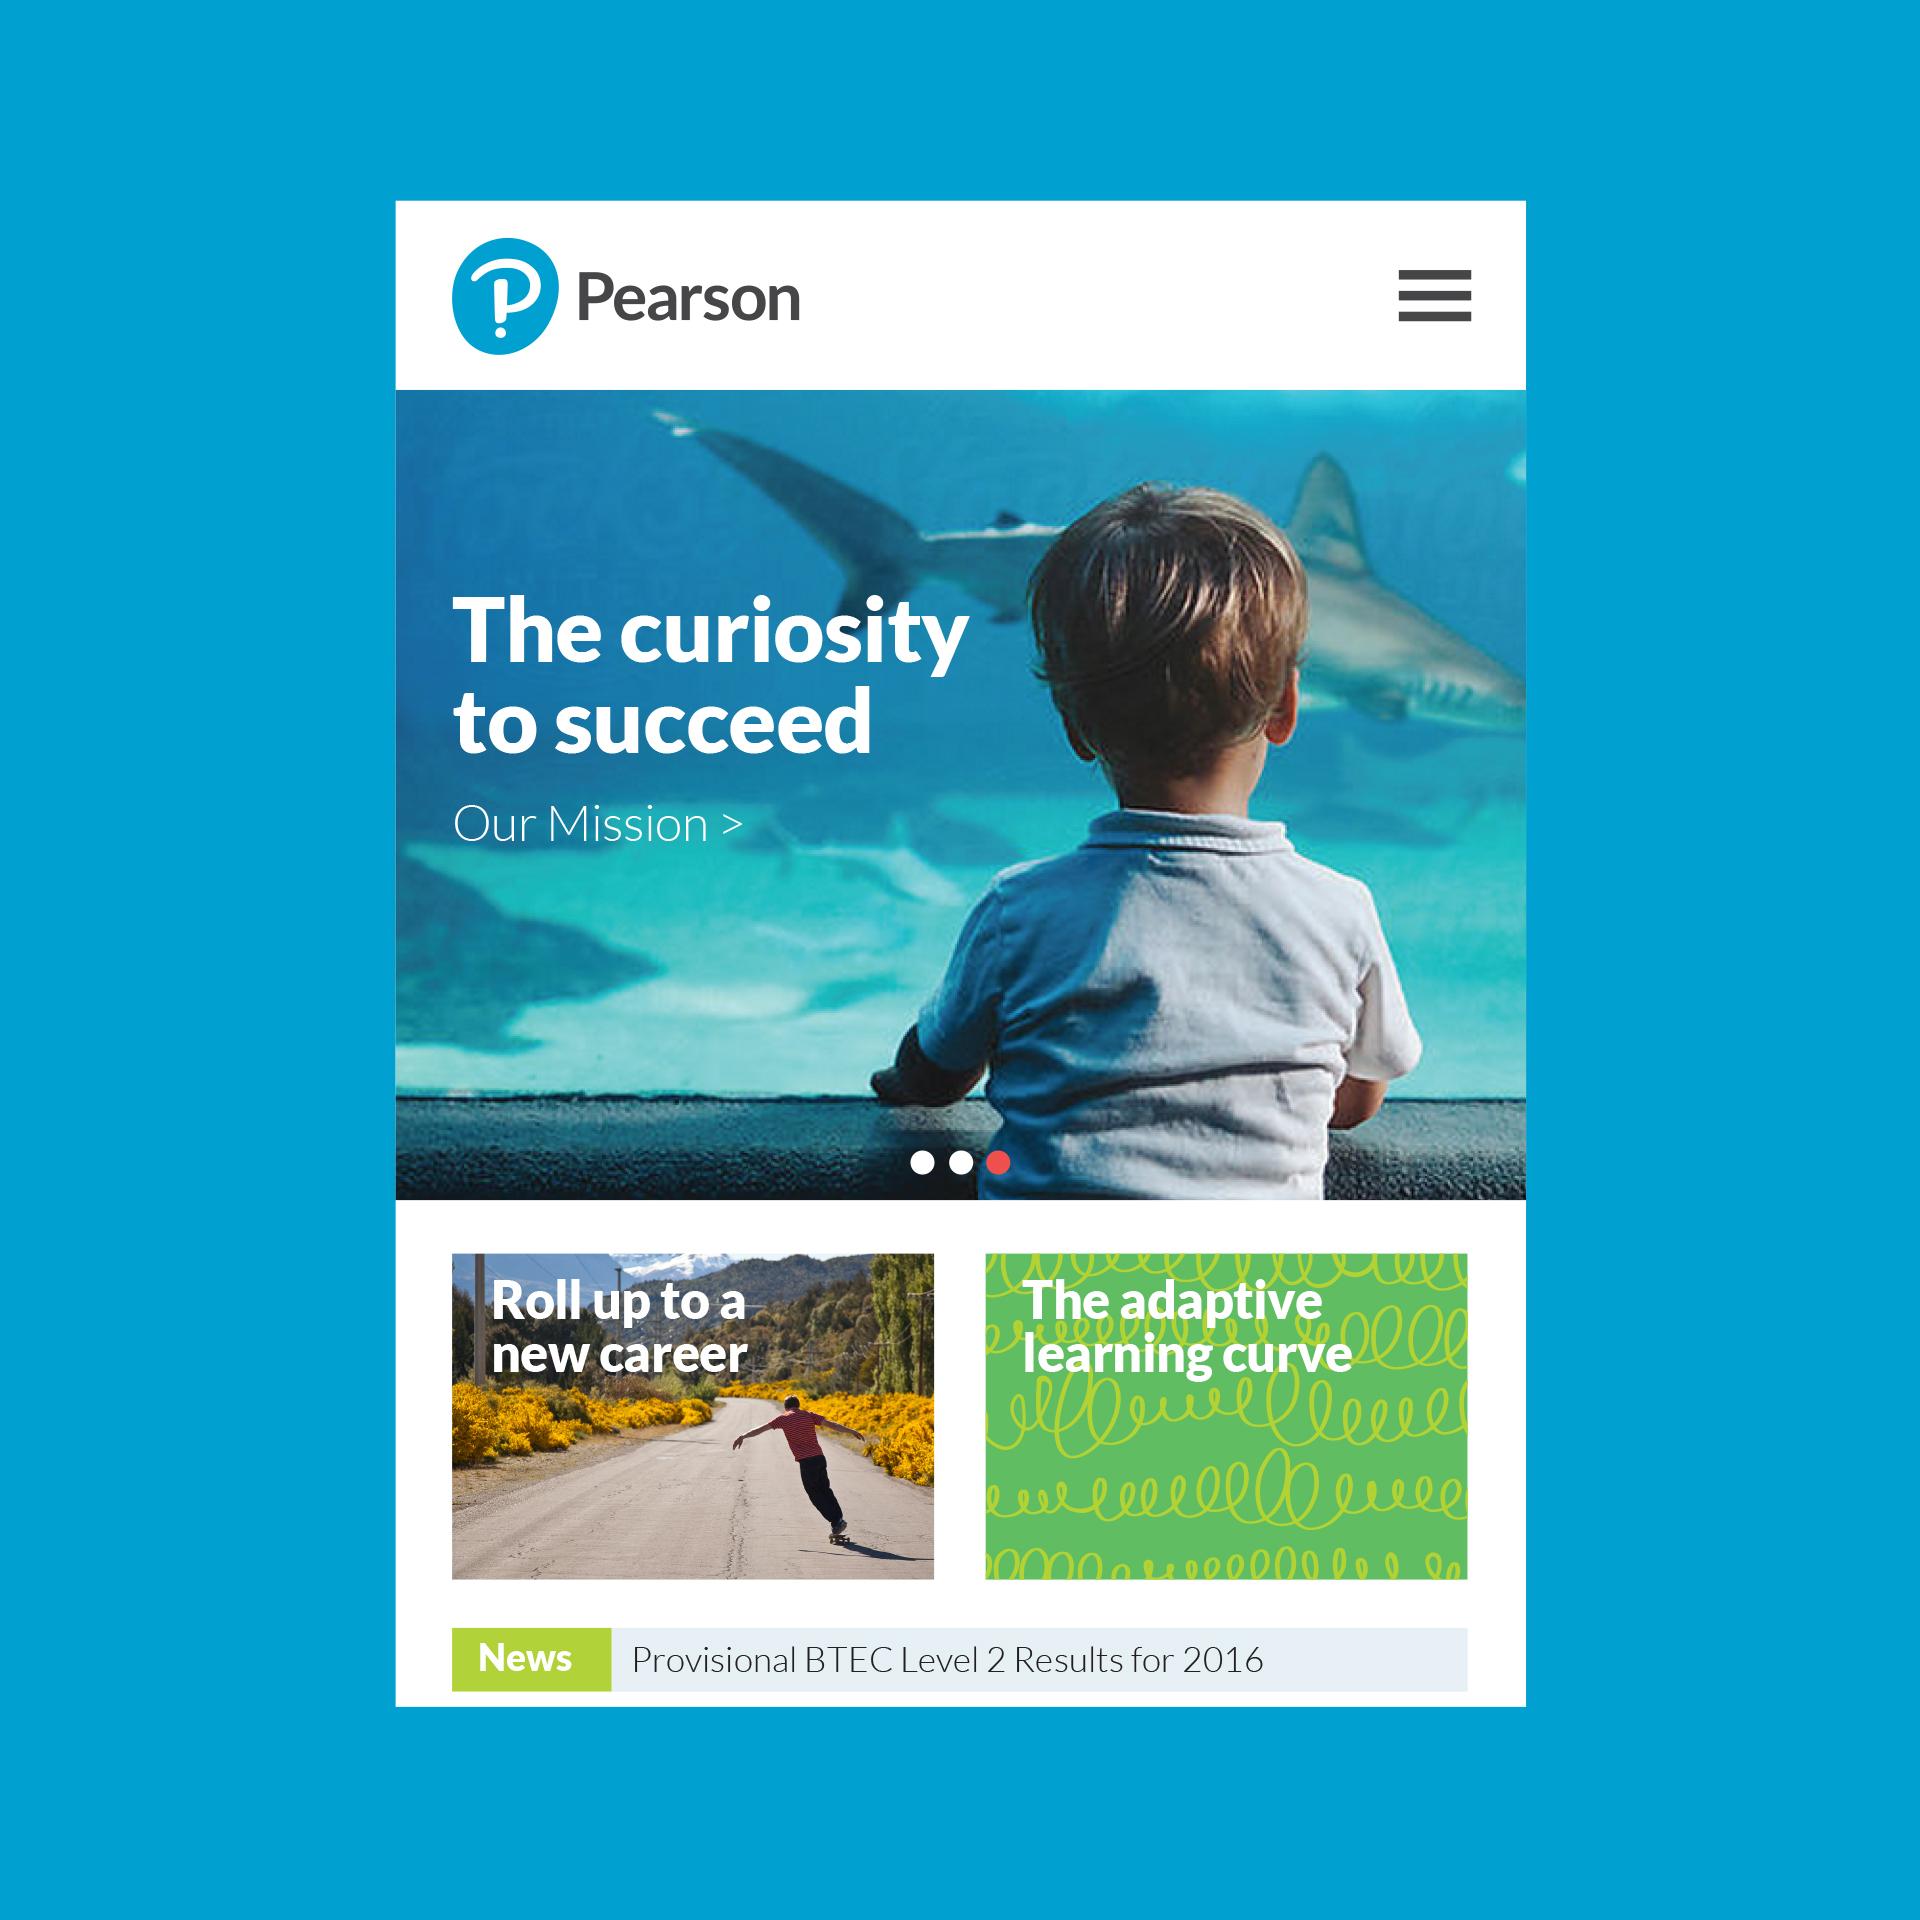 PearsonLogoWebsite01